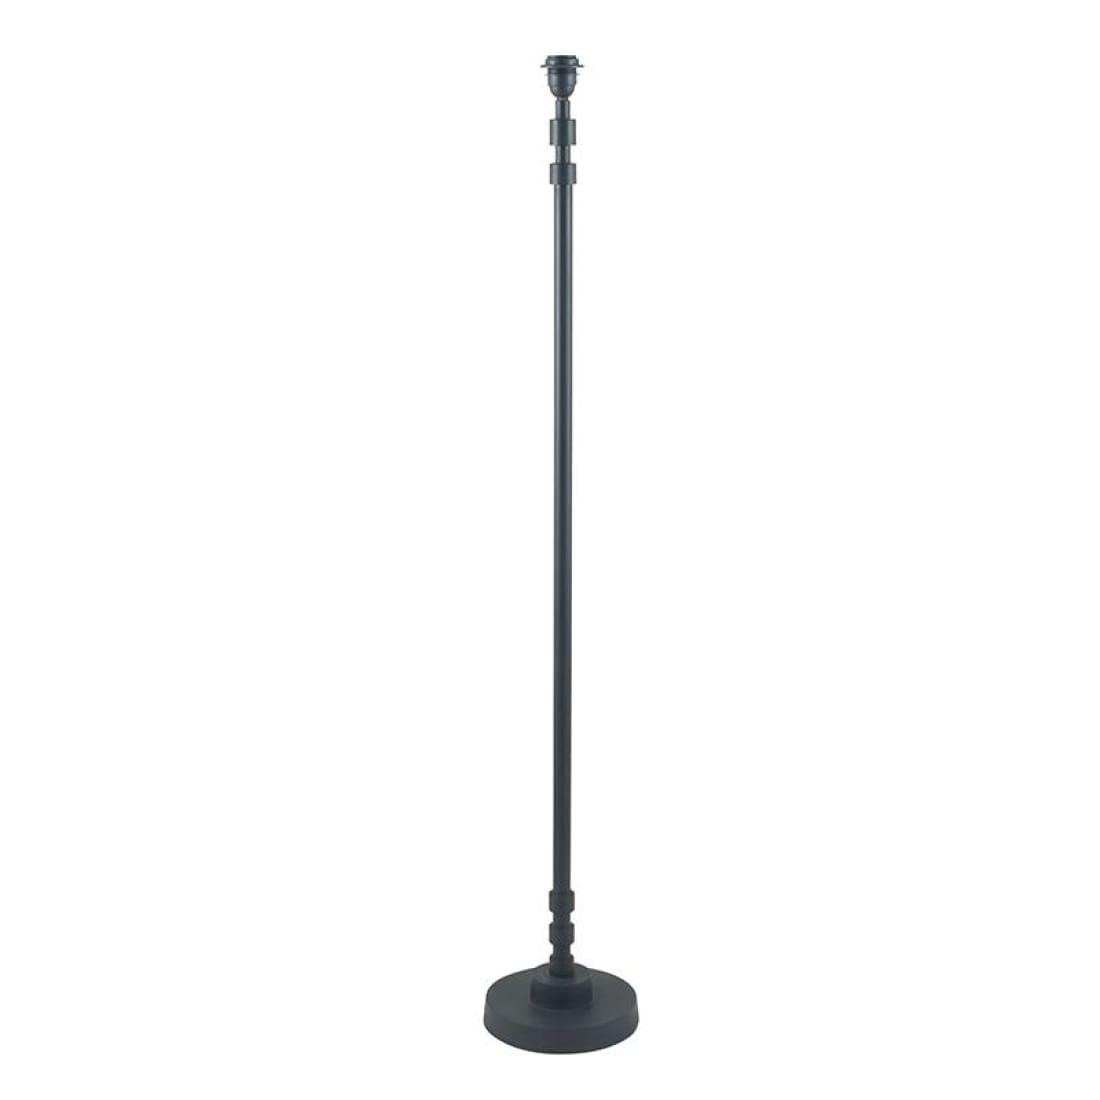 Pacific Lifestyle Pipe Matt Black Stick Floor Lamp Base